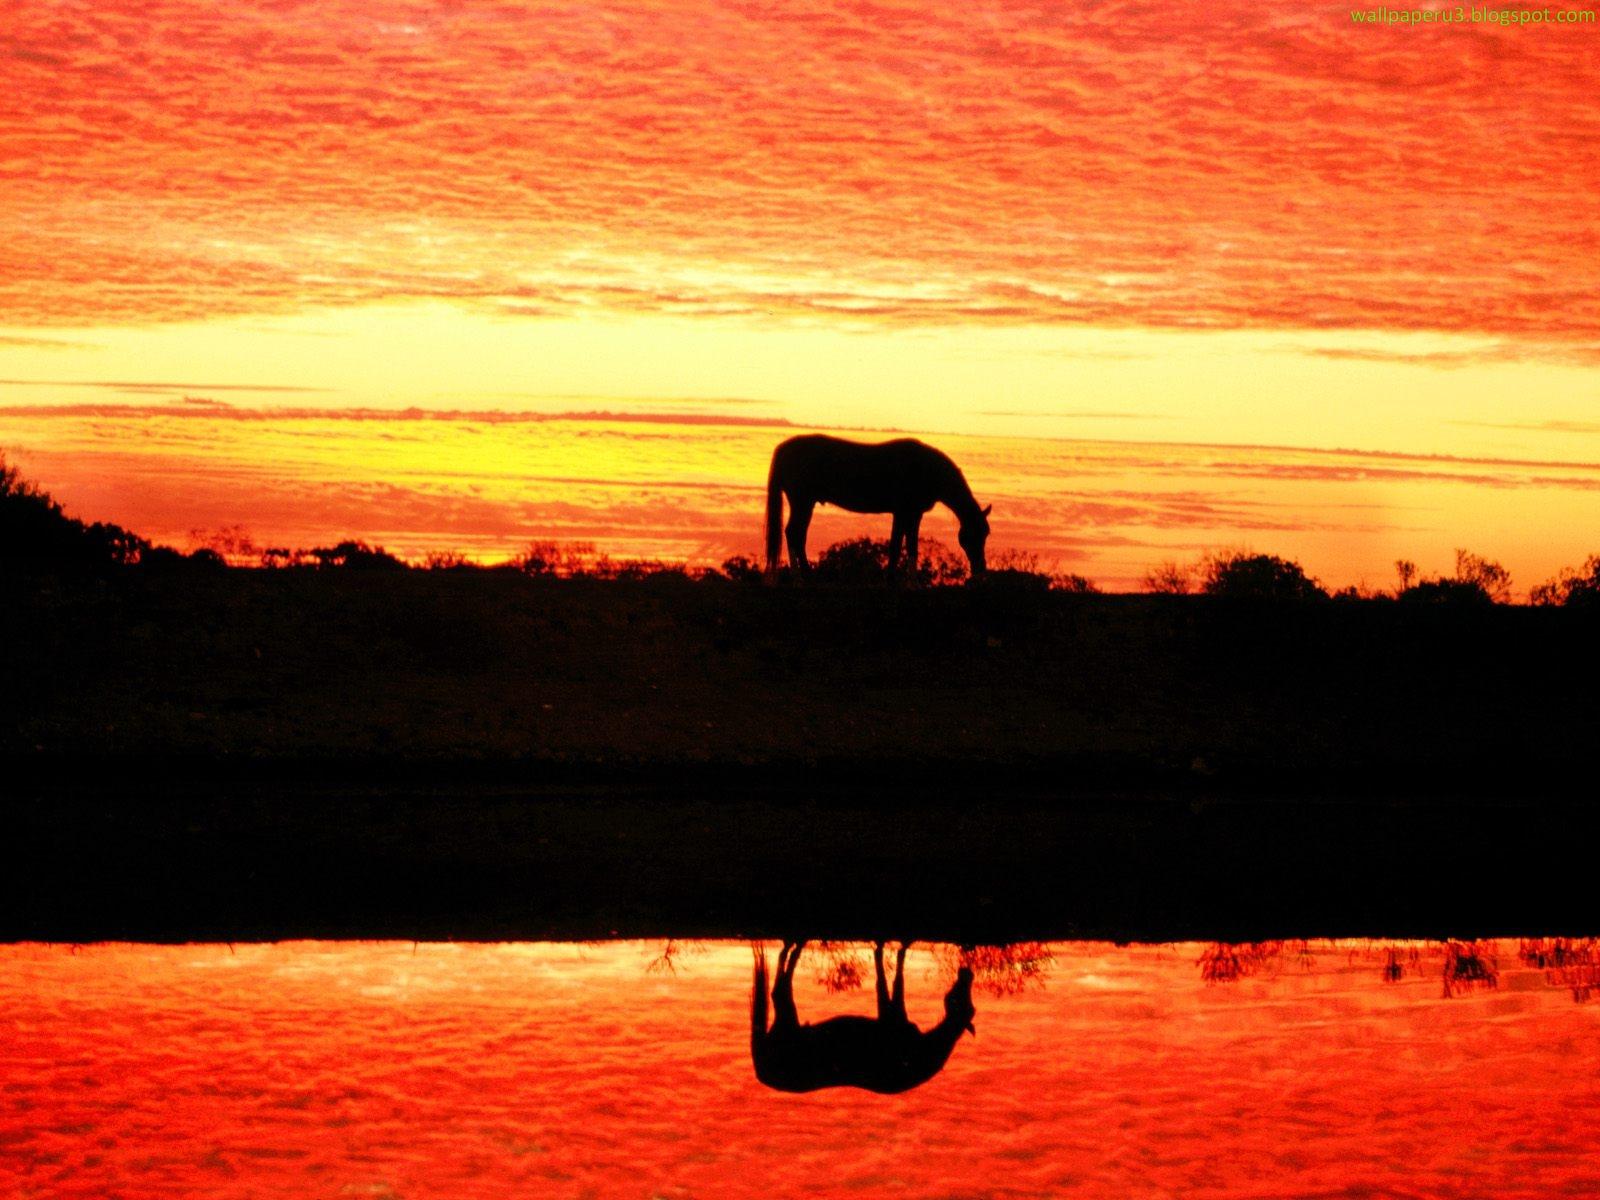 Simple   Wallpaper Horse Sunrise - 1+%2830%29  You Should Have_644976.jpg